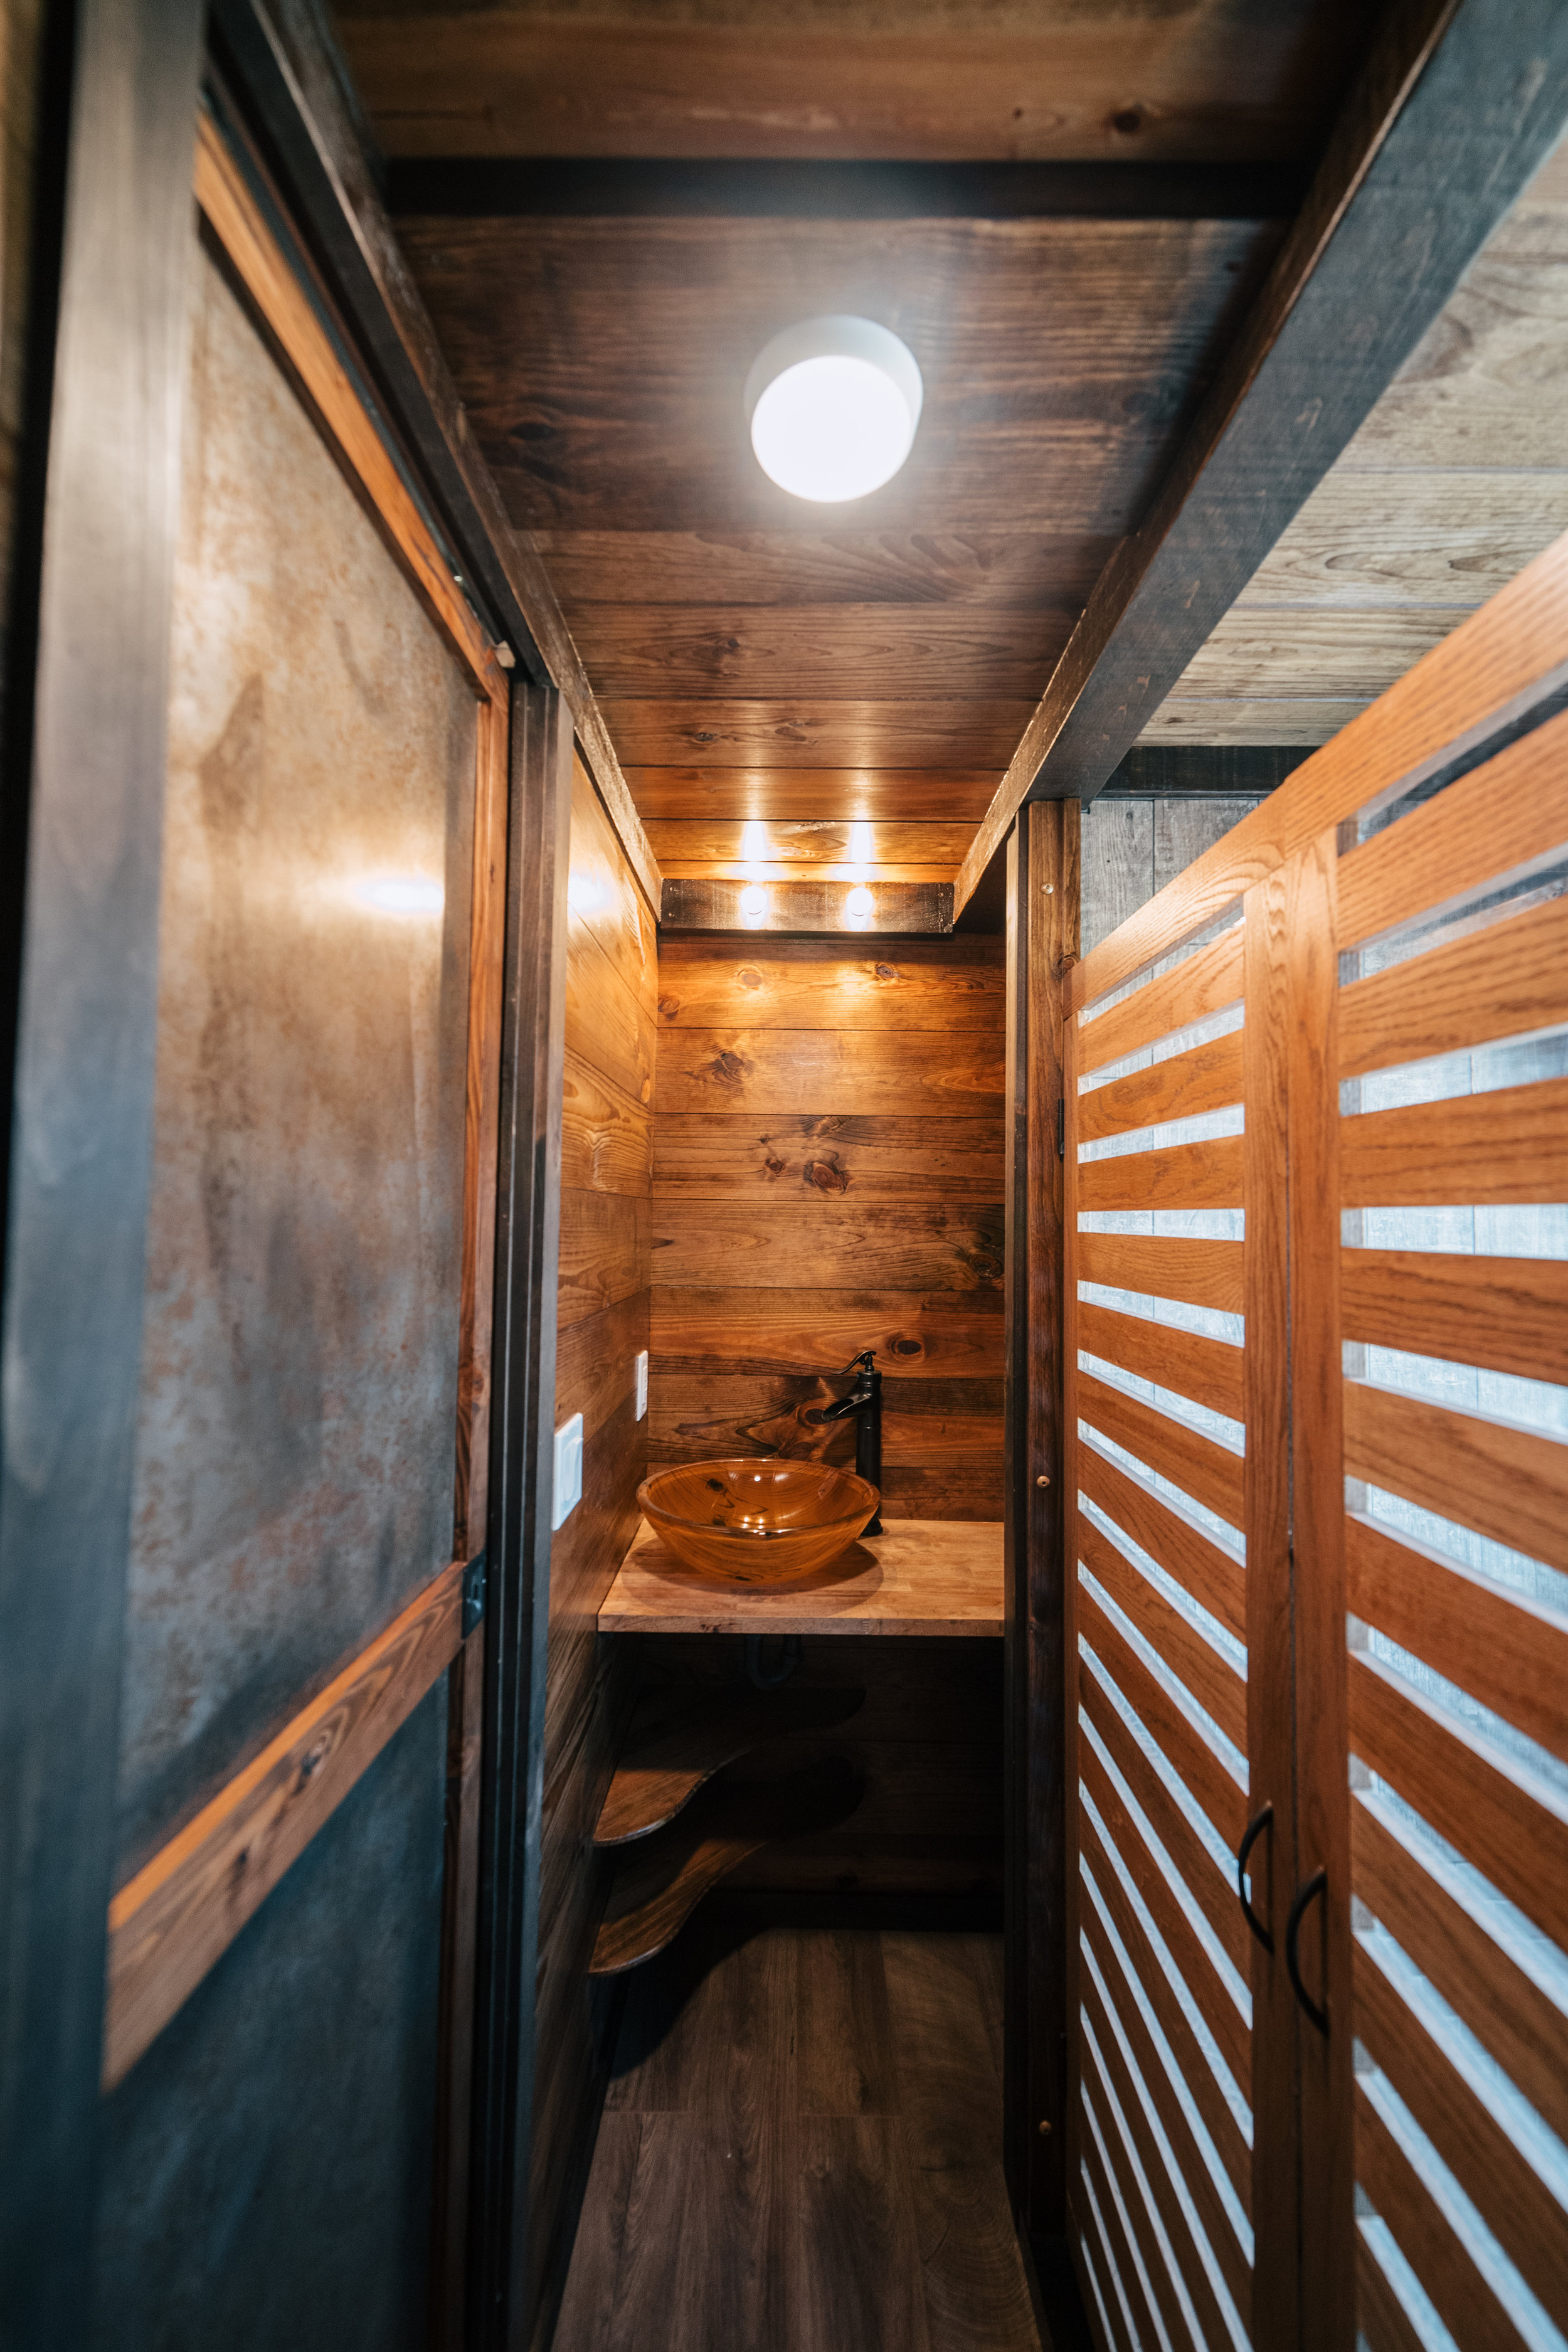 The Silhouette by Wind River Tiny Homes - patina steel pocket door, glass vessel sink, oak wood slat/Plexiglass shower stall doors